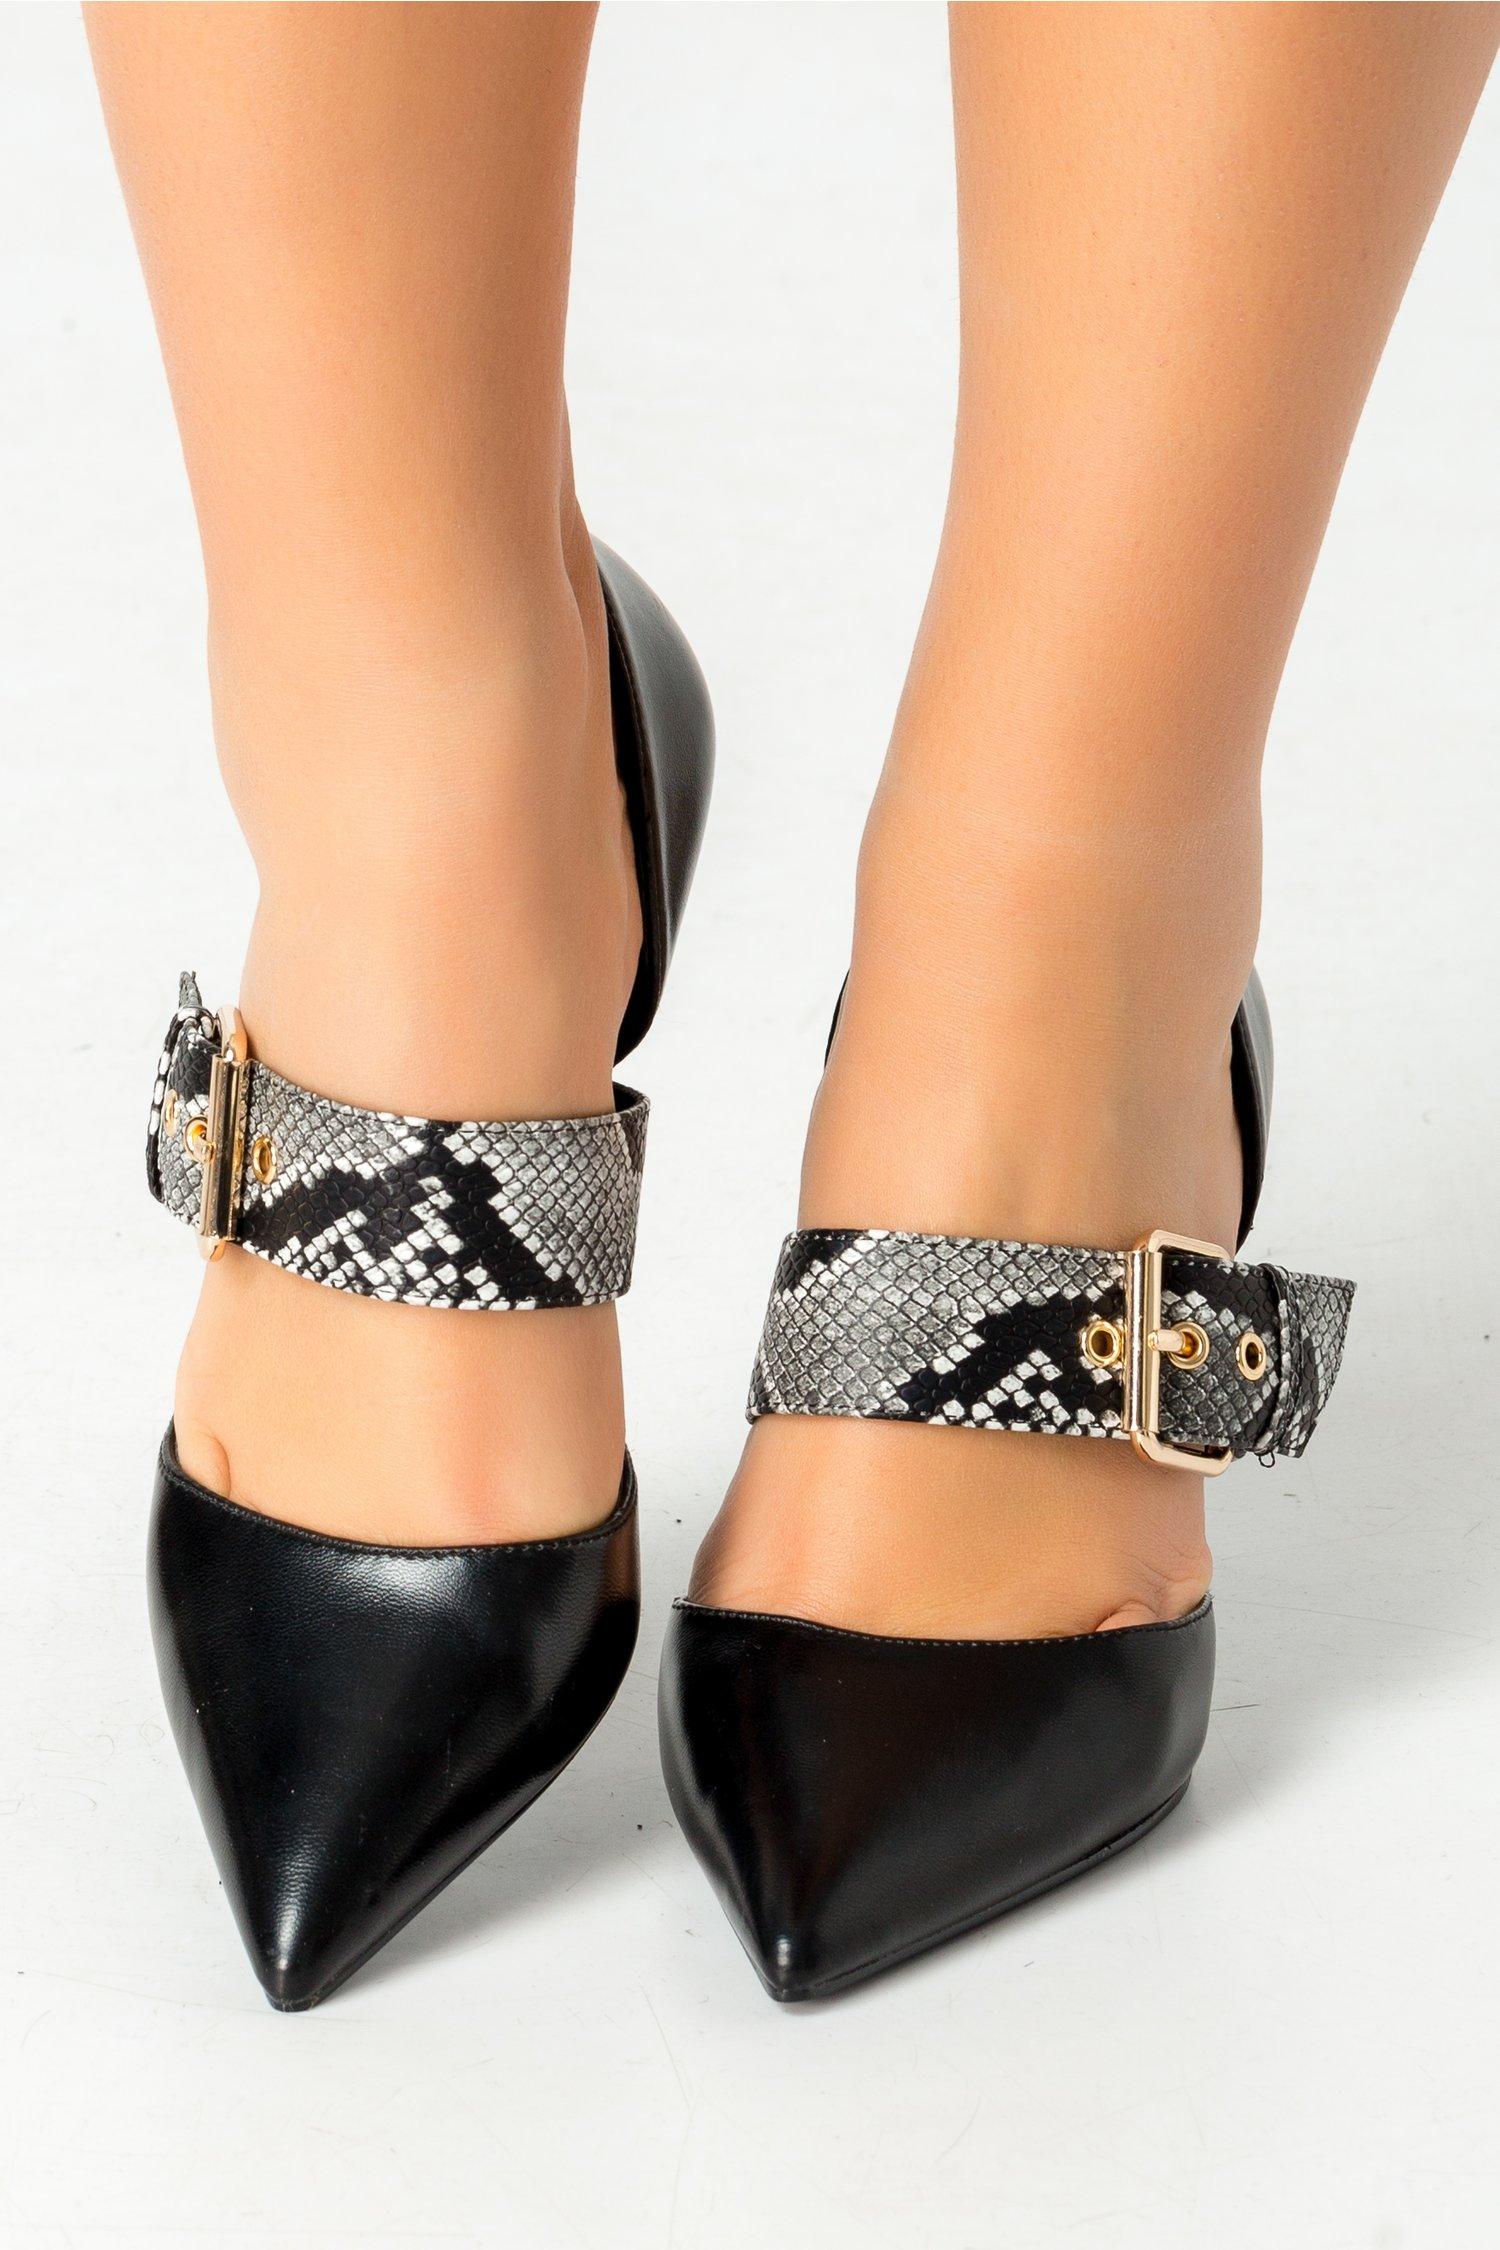 Pantofi stiletto negri cu print piele de sarpe